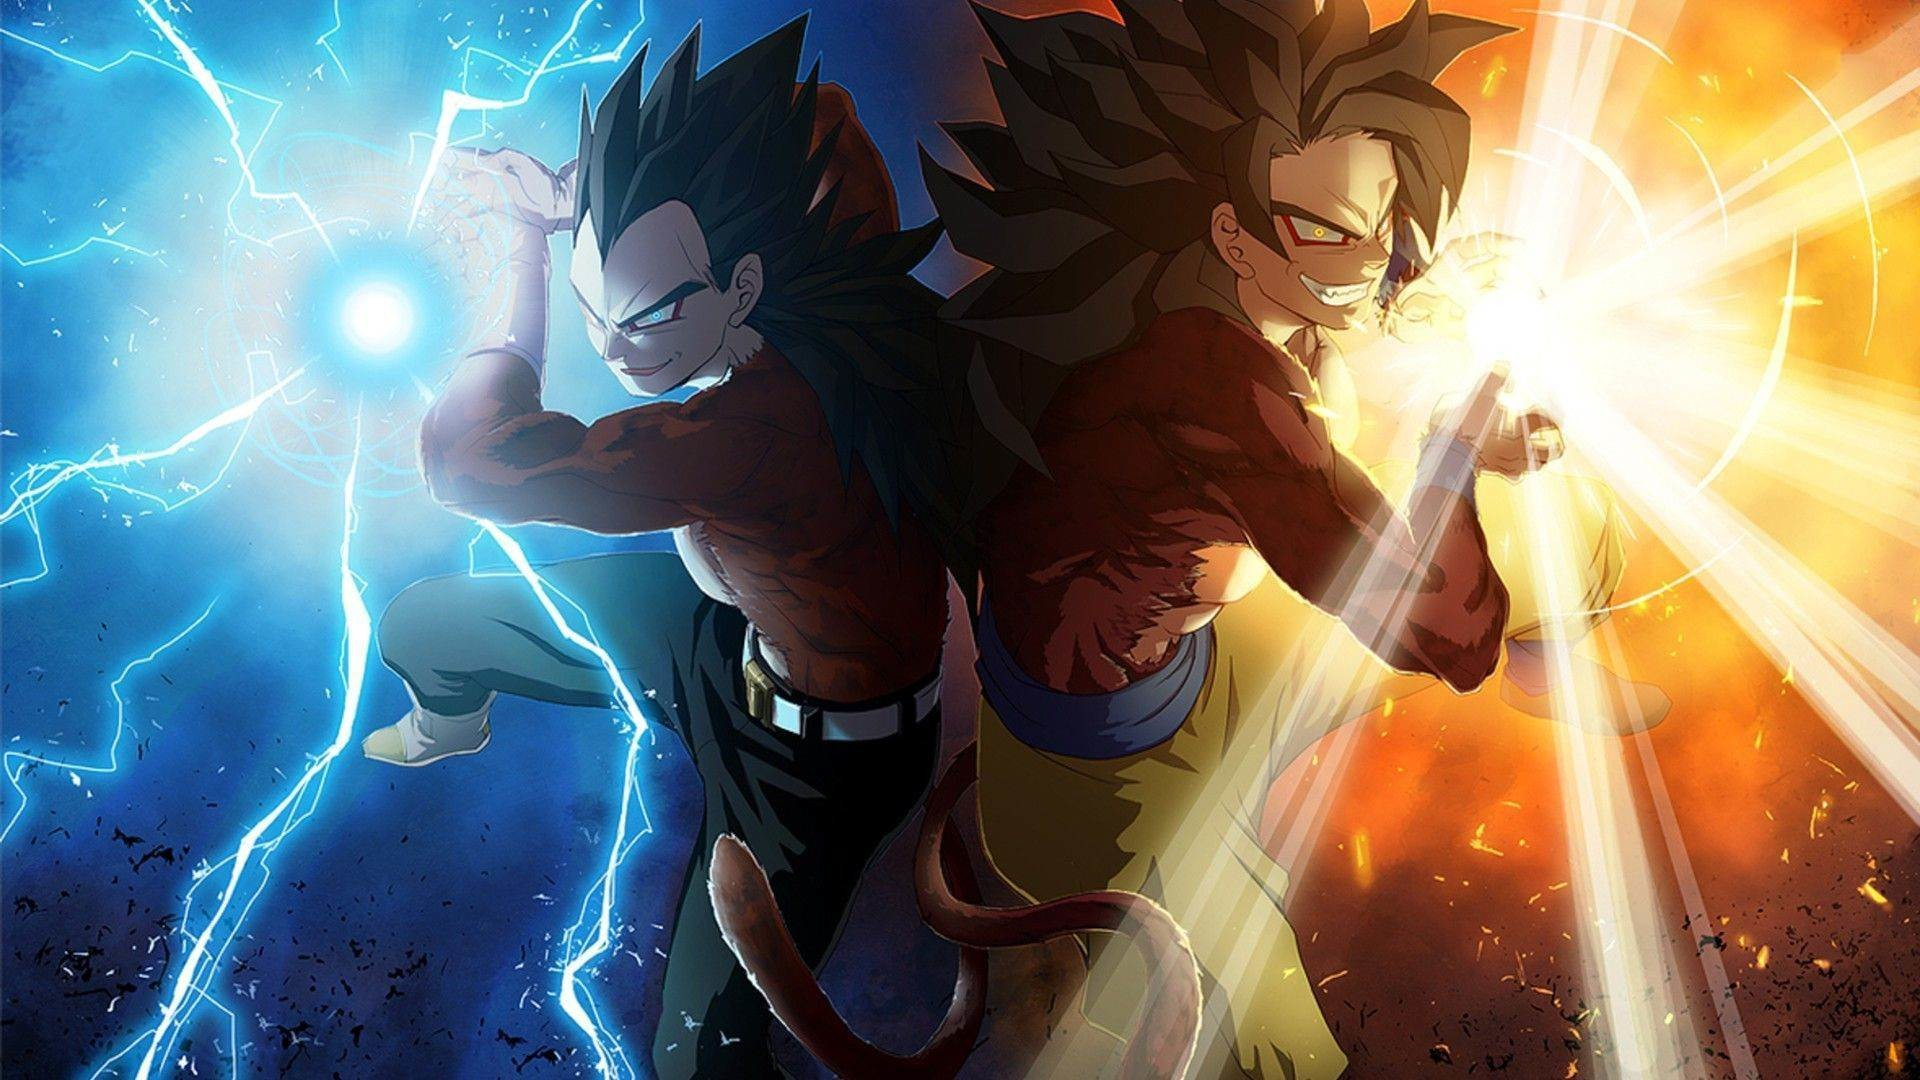 Goku Iphone Wallpaper 64 Images